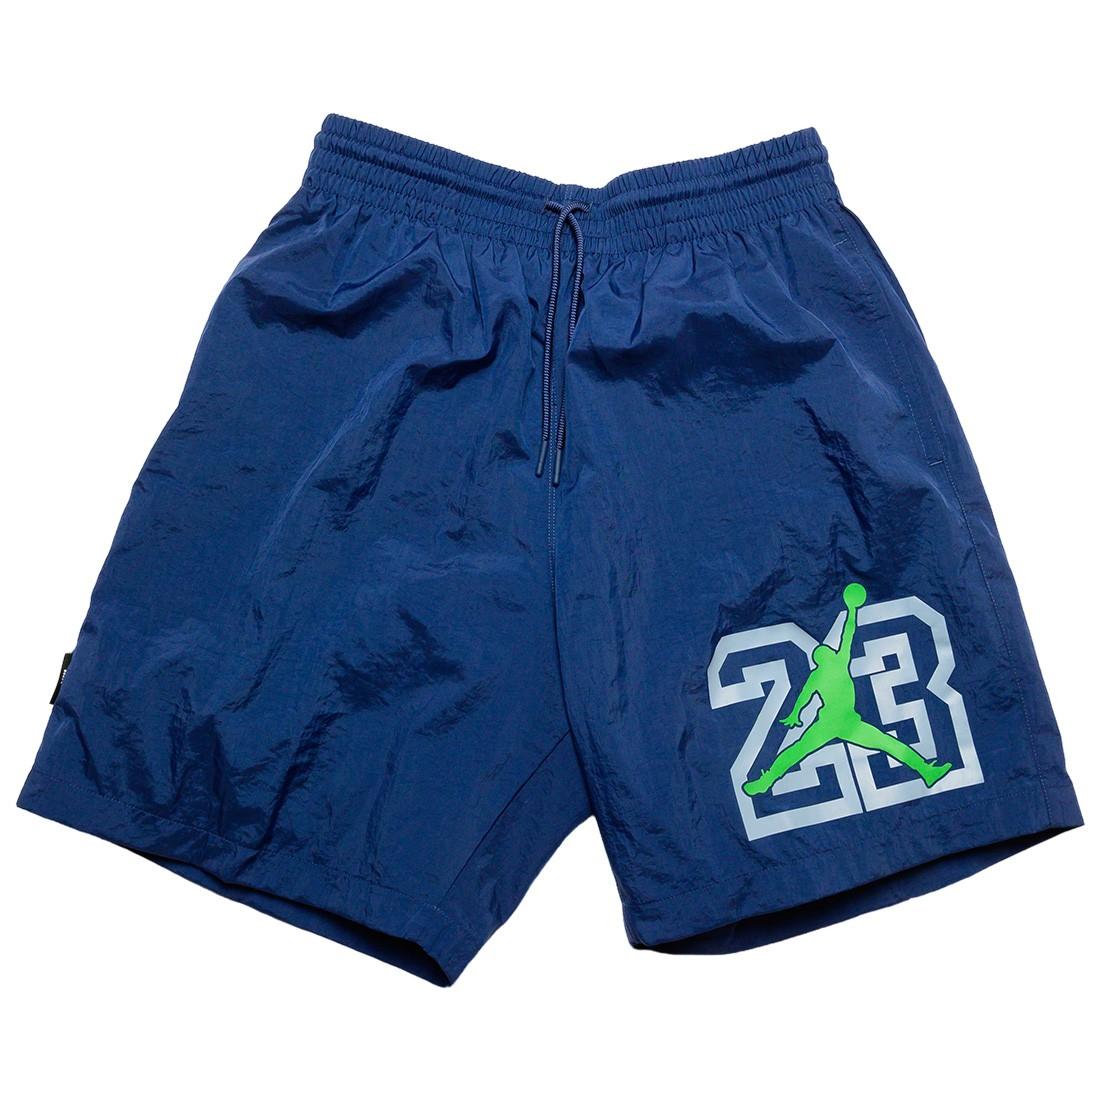 Jordan Men Legacy AJ13 Poolside Shorts (navy)